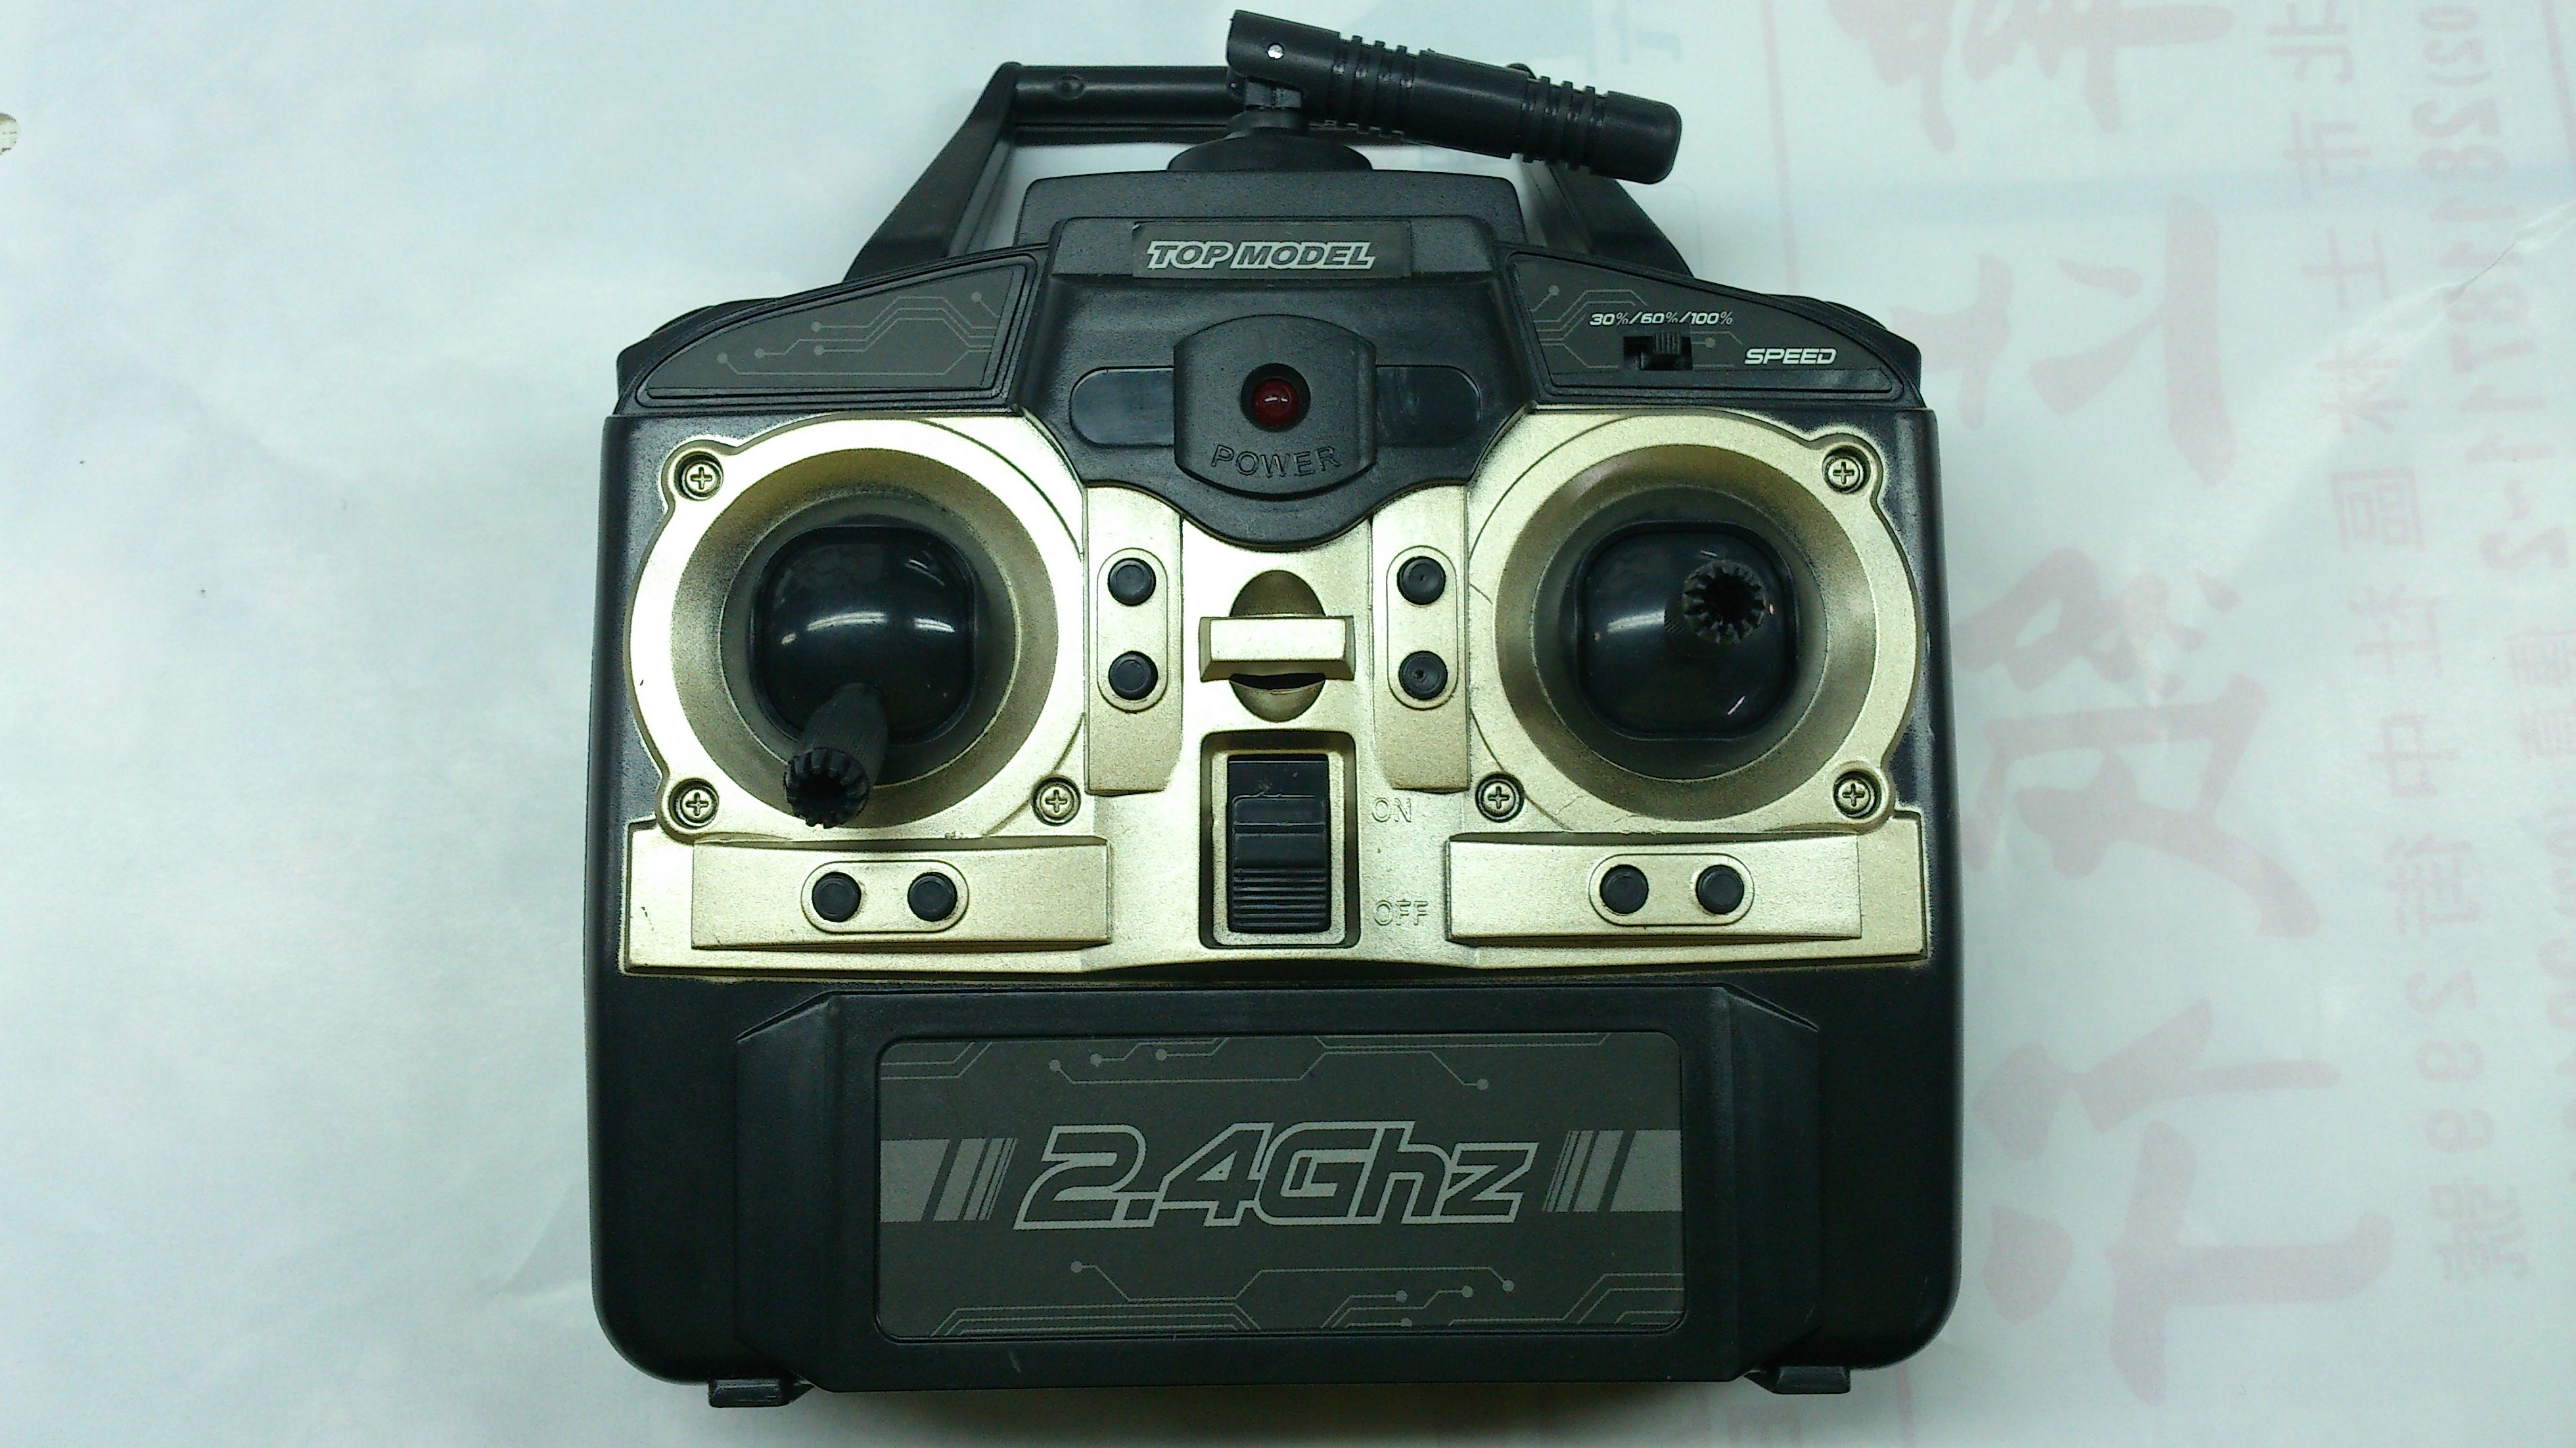 X40V專用遙控器、序號X40-17、直銷價500元